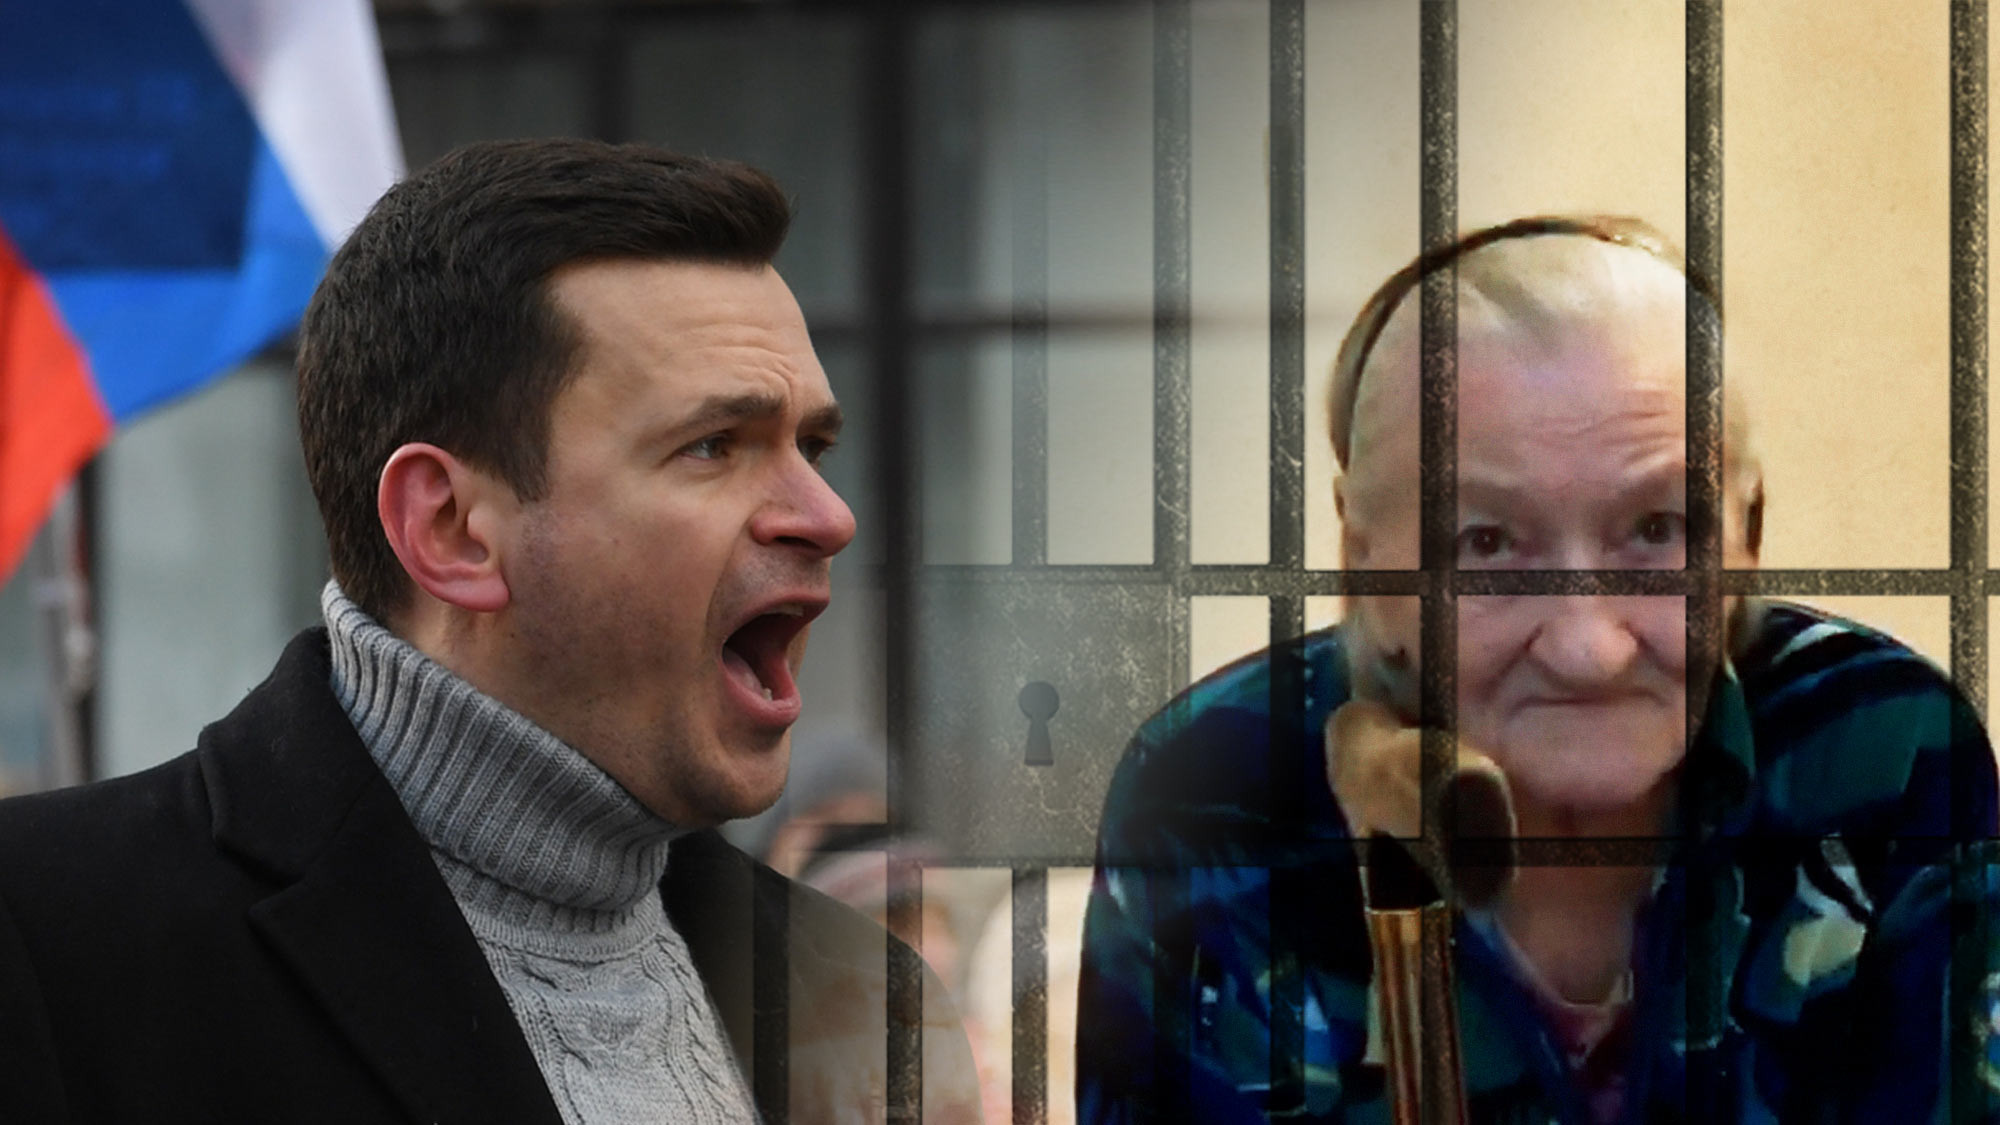 <p>Коллаж &copy; L!FE. Фото: &copy; L!FE, &copy; РИА Новости/Кирилл Каллиников</p>